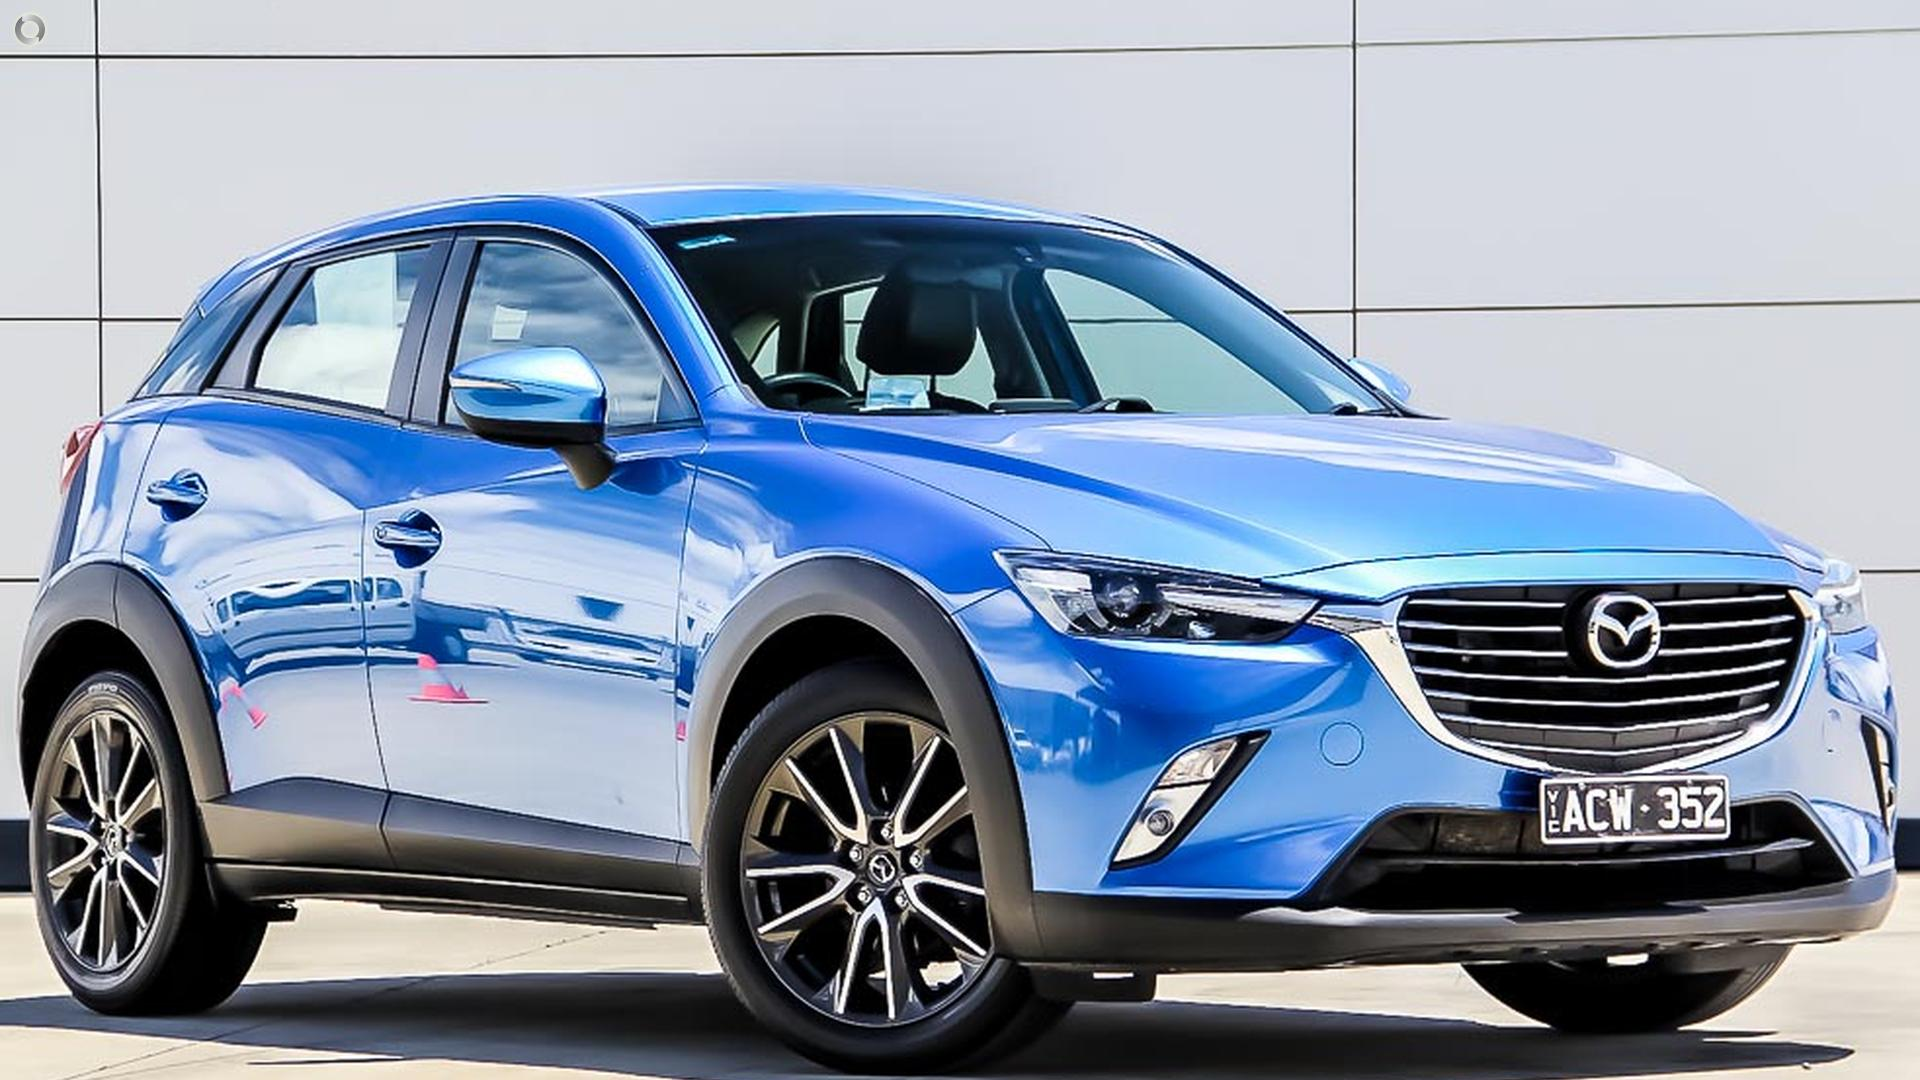 2015 Mazda Cx-3 DK